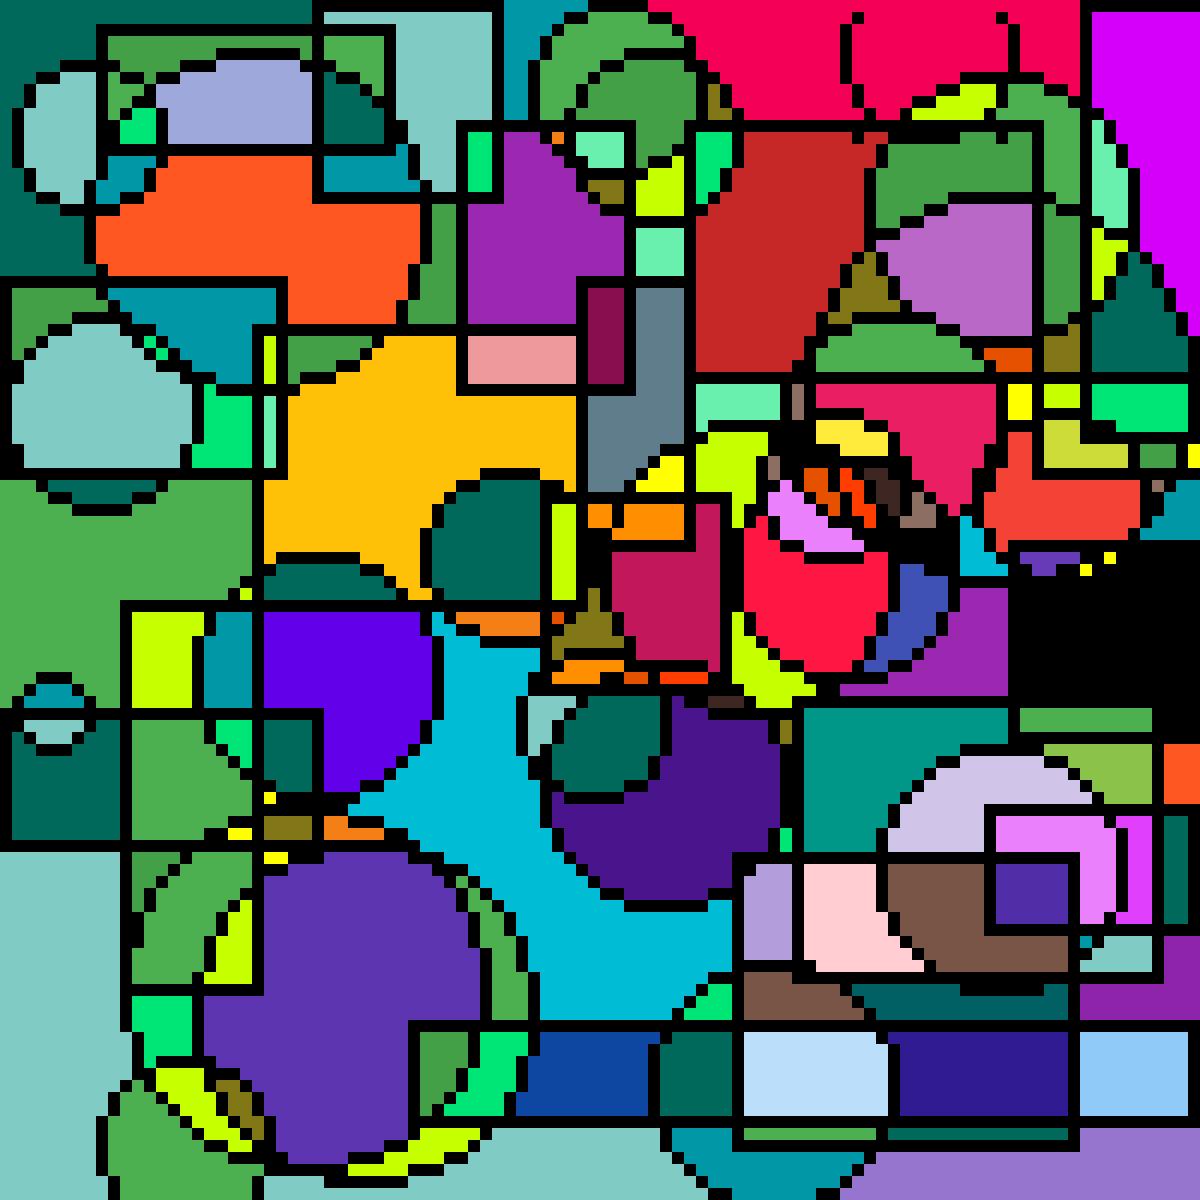 Patterns 21 by OrangeBowser039